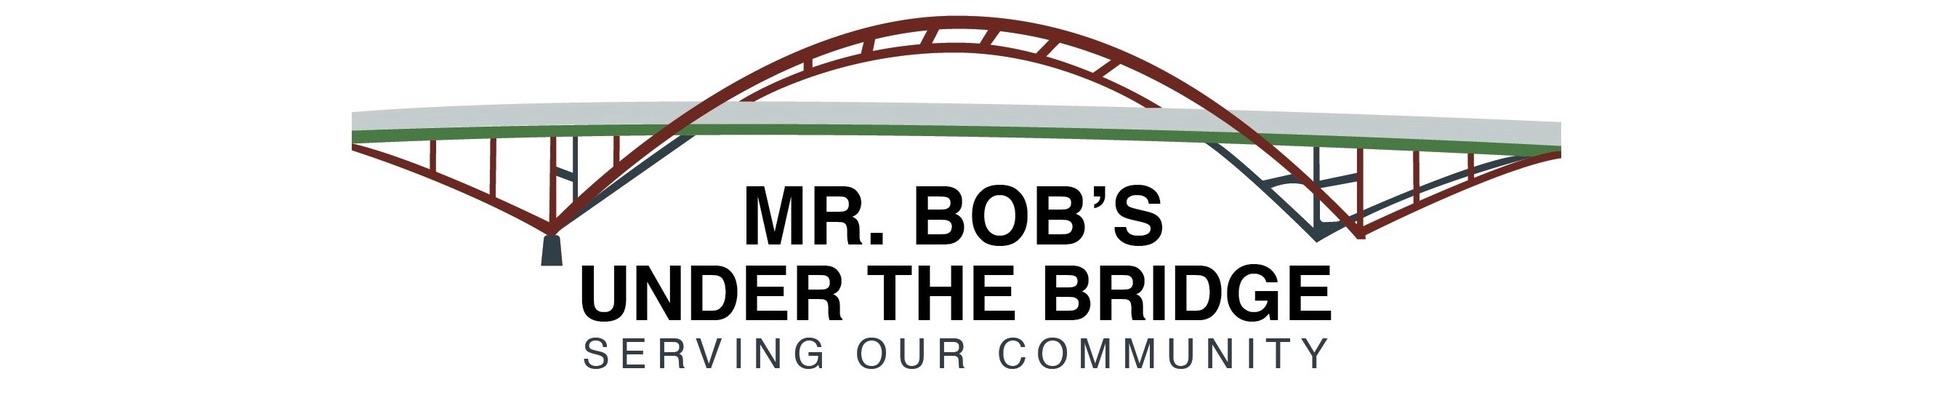 Mr. Bob's Under the Bridge Inc | Serving the Homeless Community